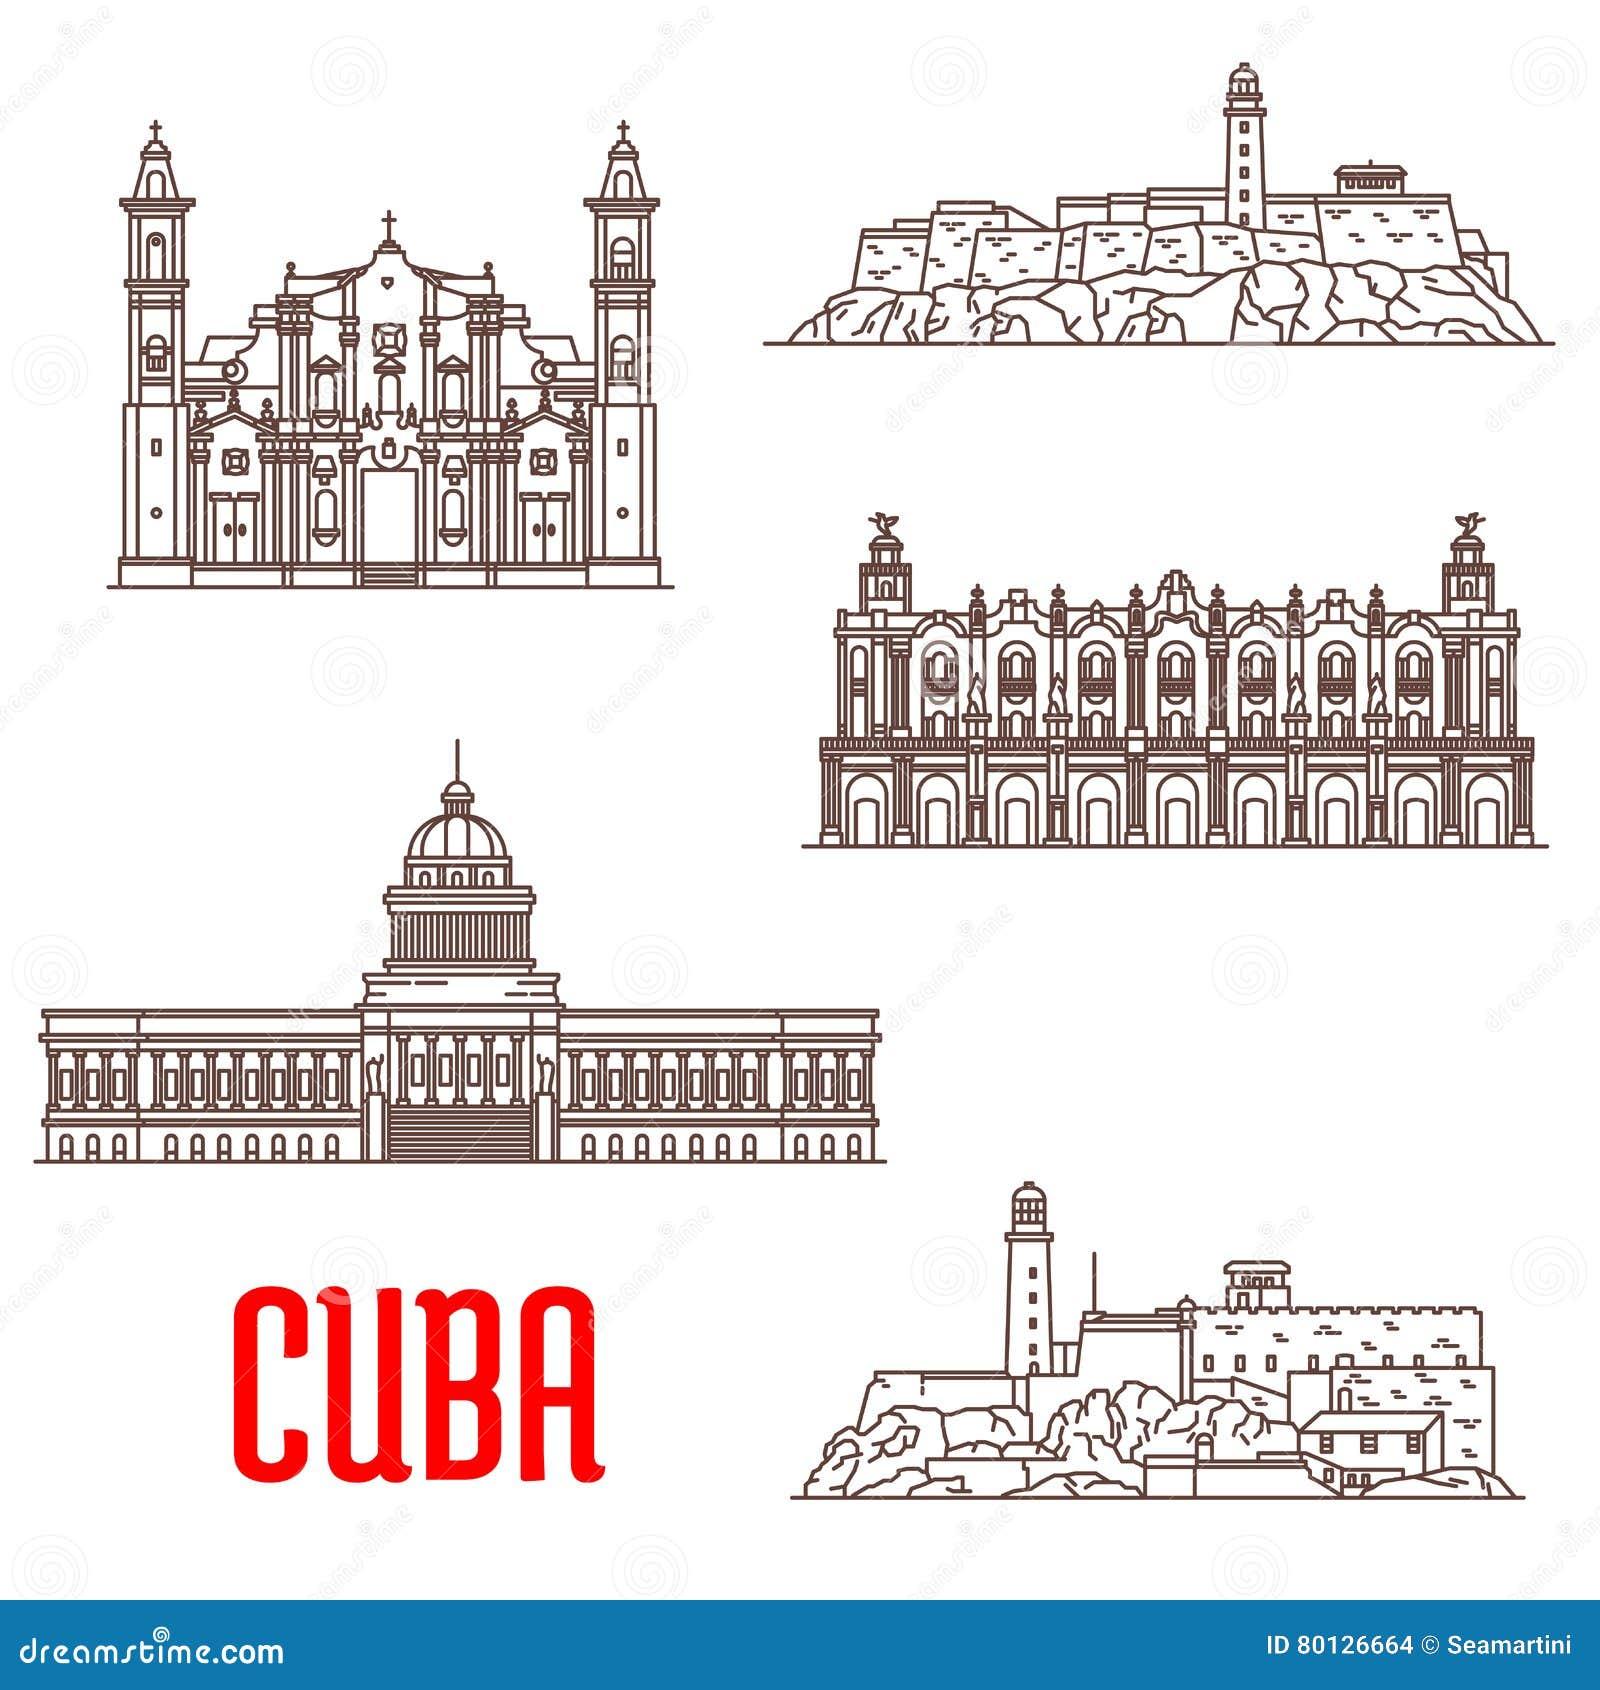 Lujoso Dibujos De Cubs Para Colorear Ideas - Dibujos Para Colorear ...